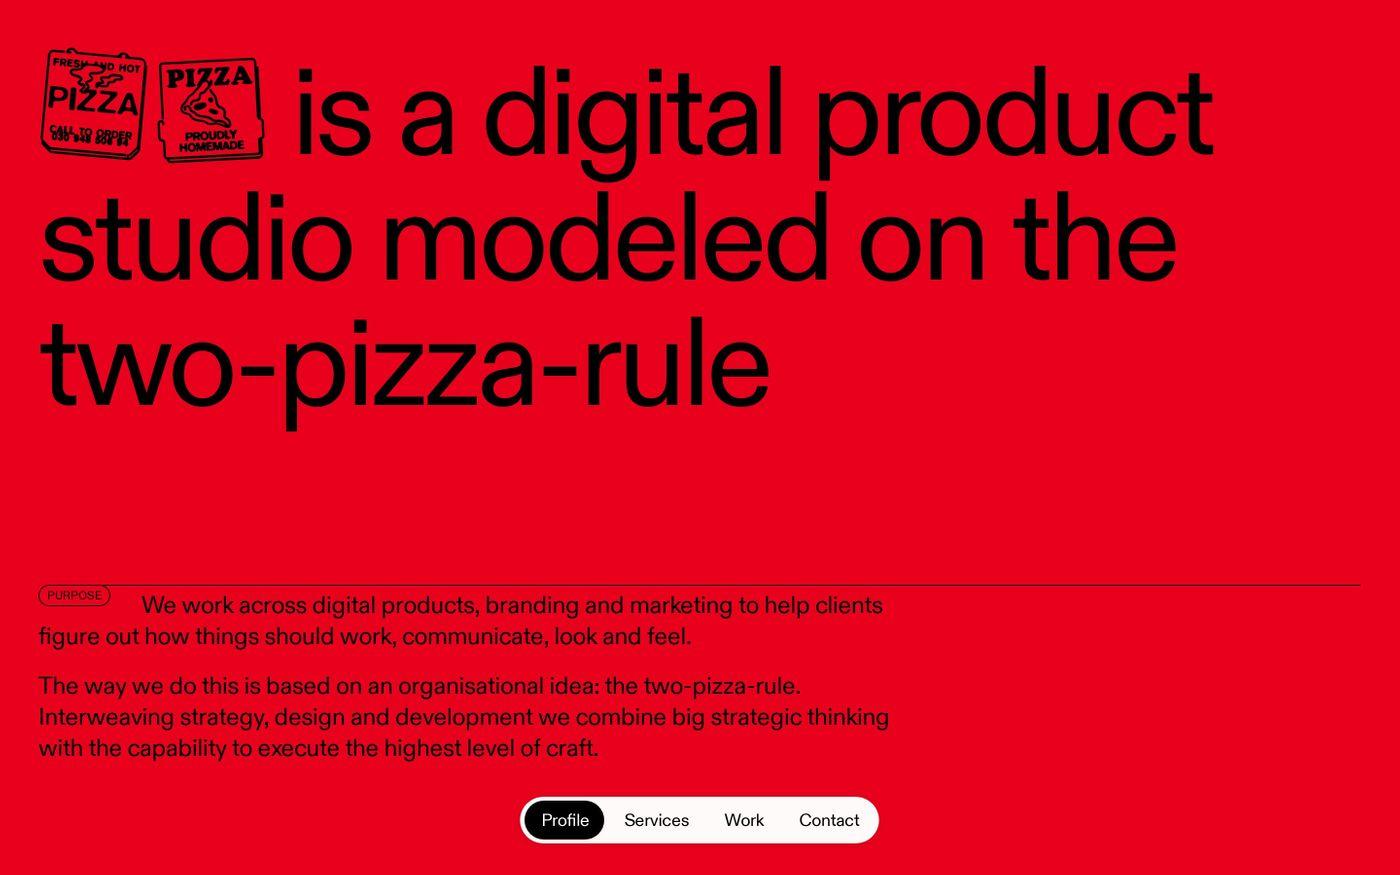 Screenshot of Pizza Pizza website